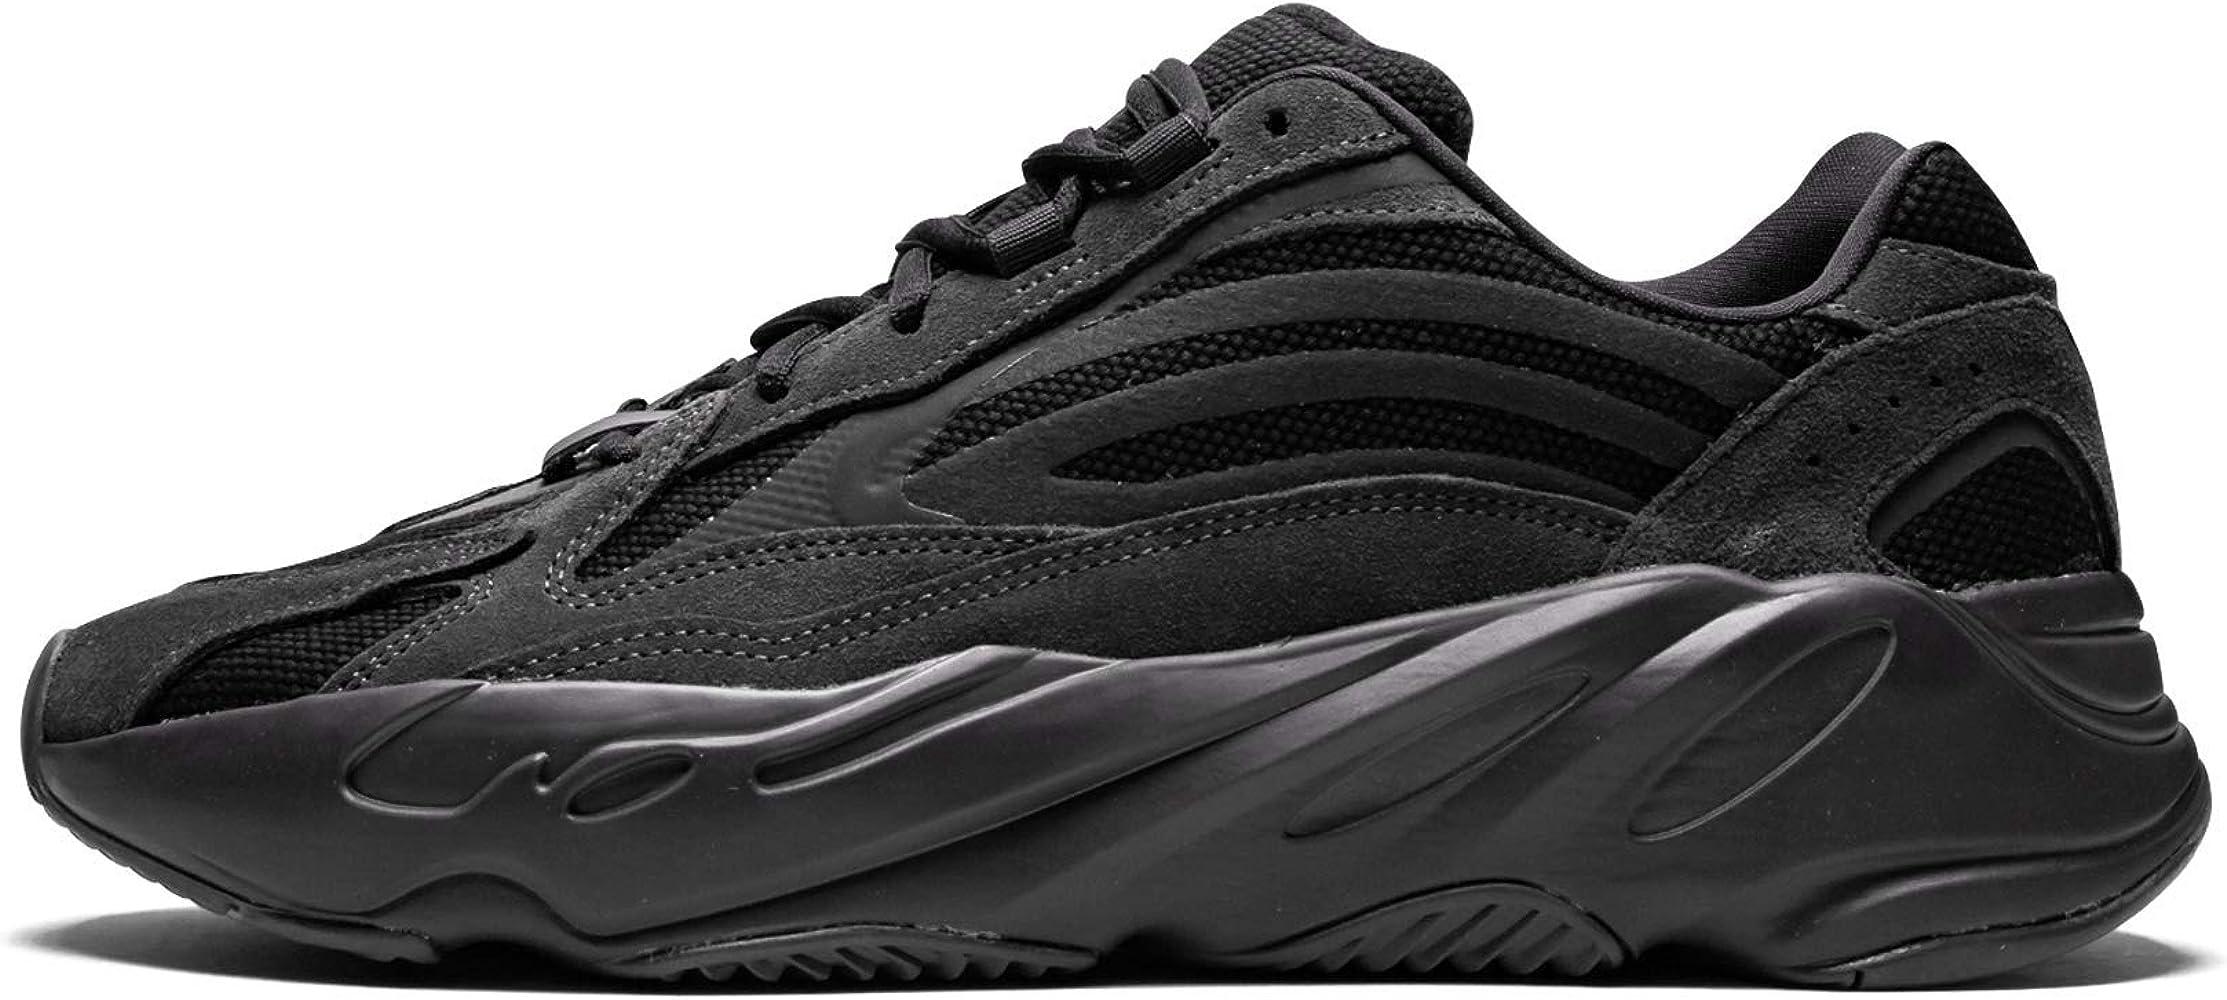 adidas Yeezy Boost 700 V2 (Vanta/Vanta